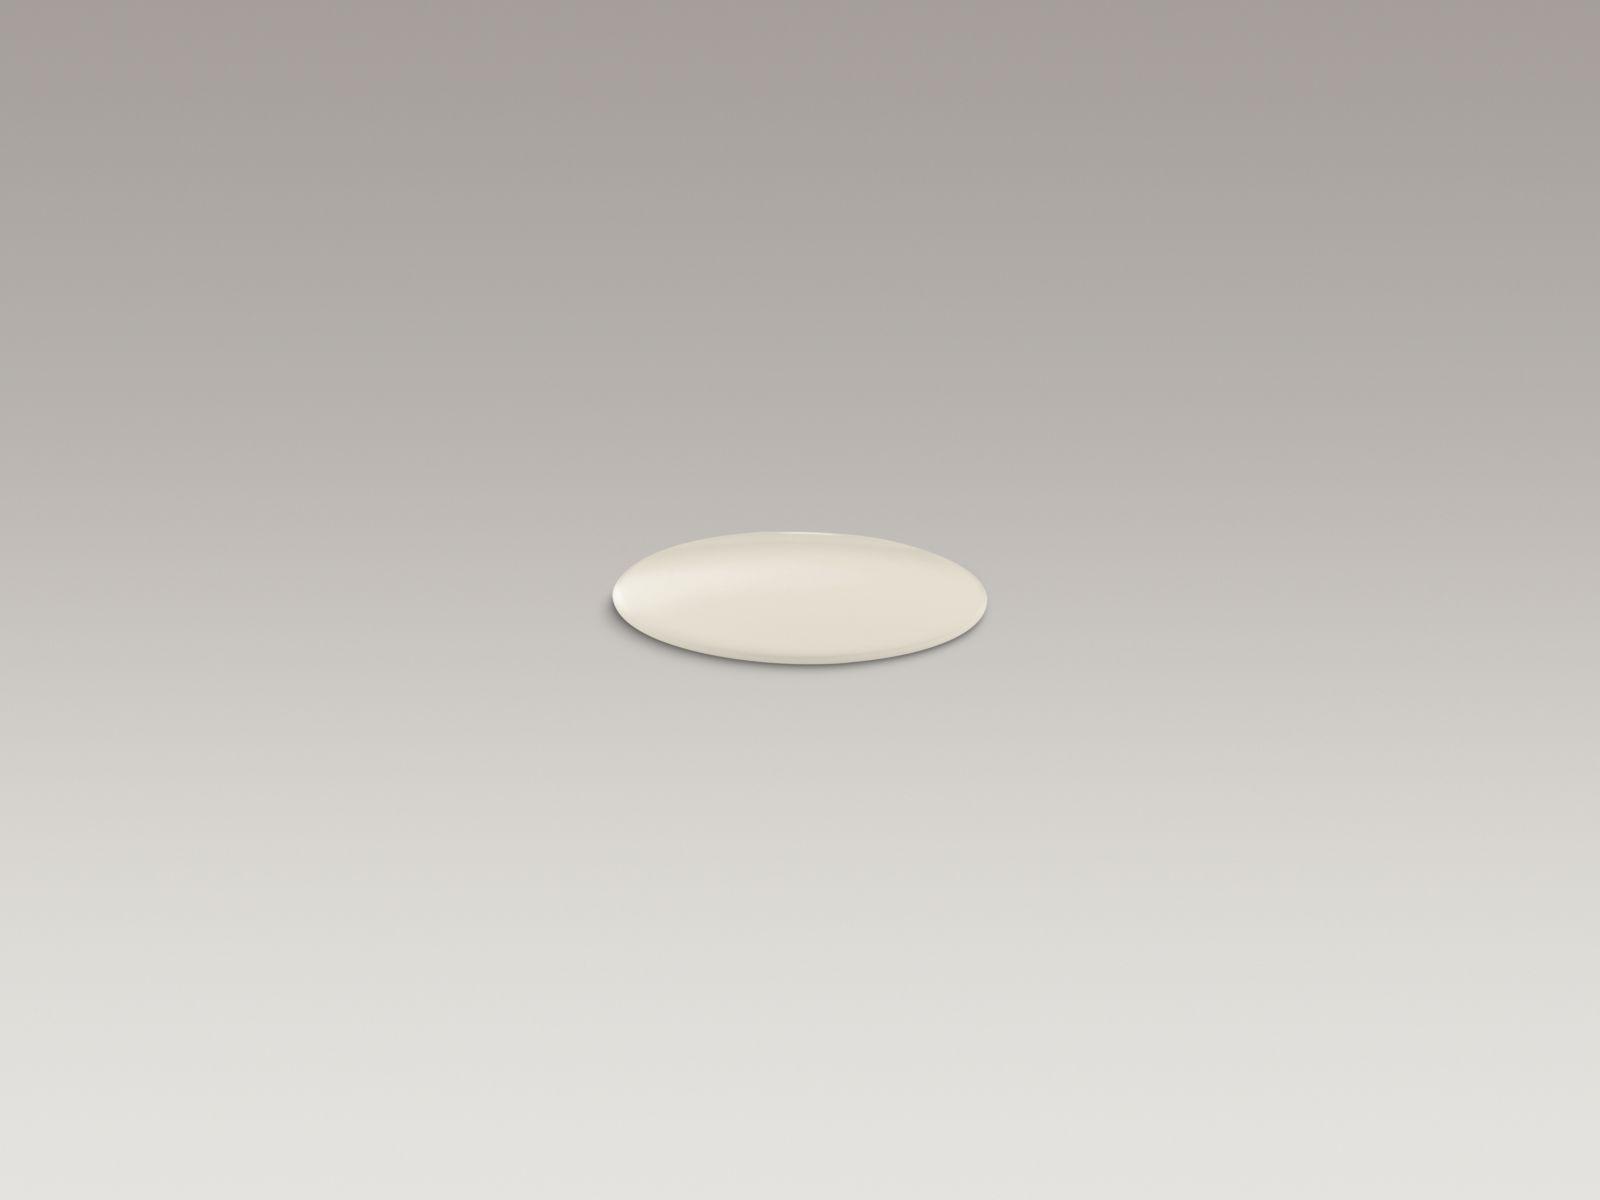 Kohler K-8830-47 Kitchen and Bathroom Sink Extra Hole Cover Almond